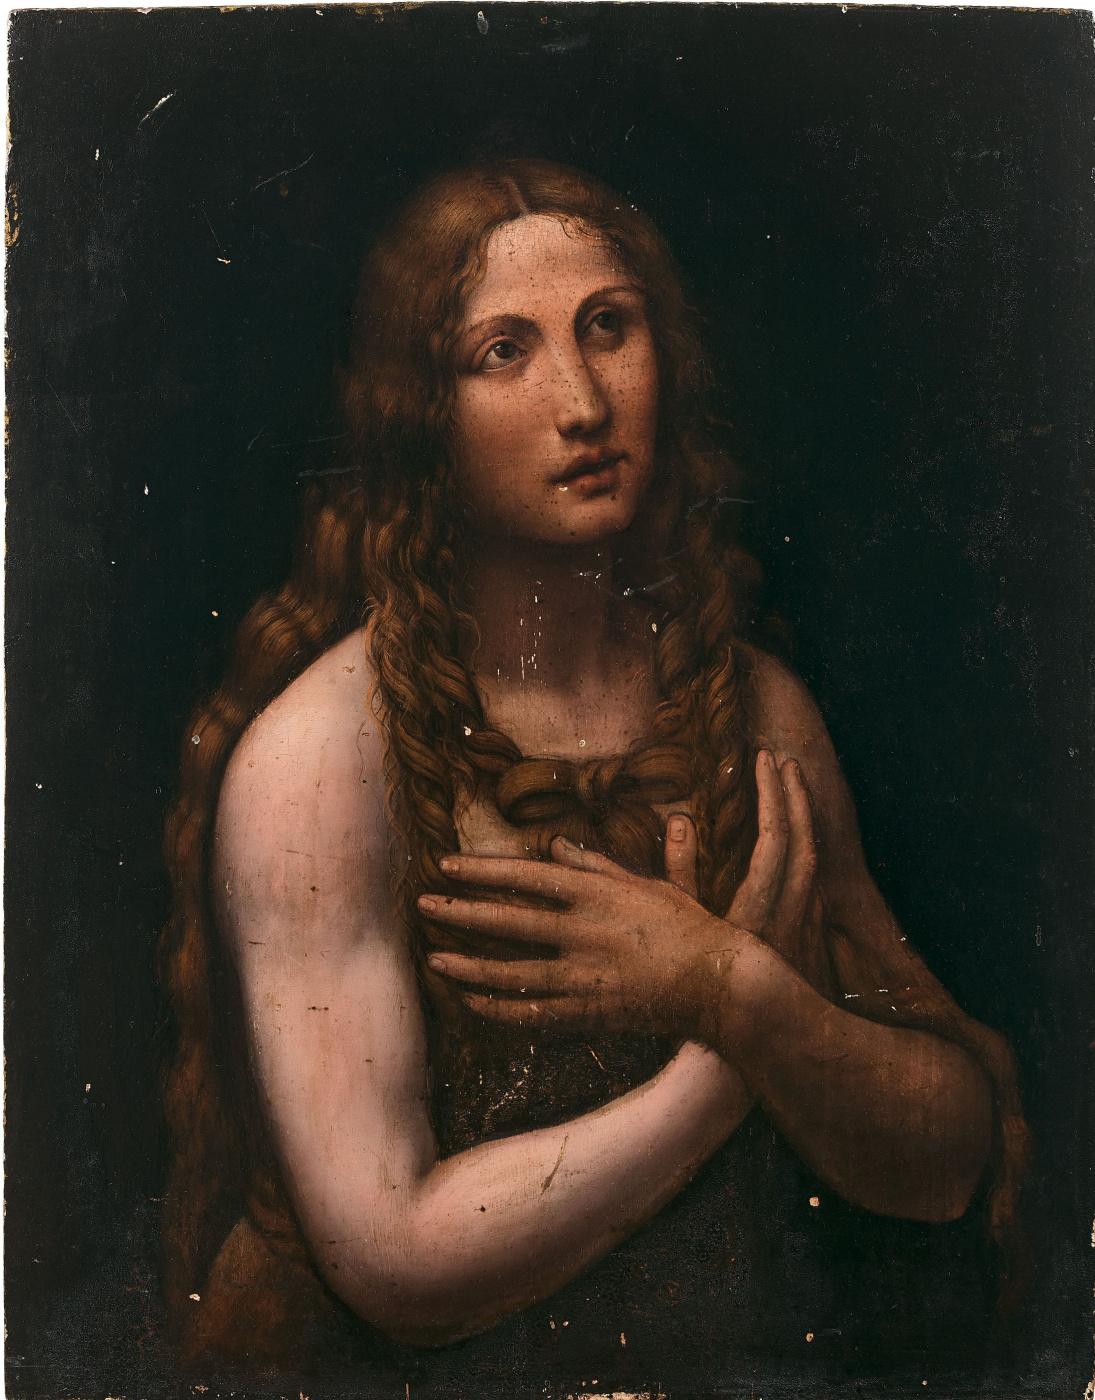 Jan Giacomo Caprotti da Oreno (Salaí). The Penitent Magdalene